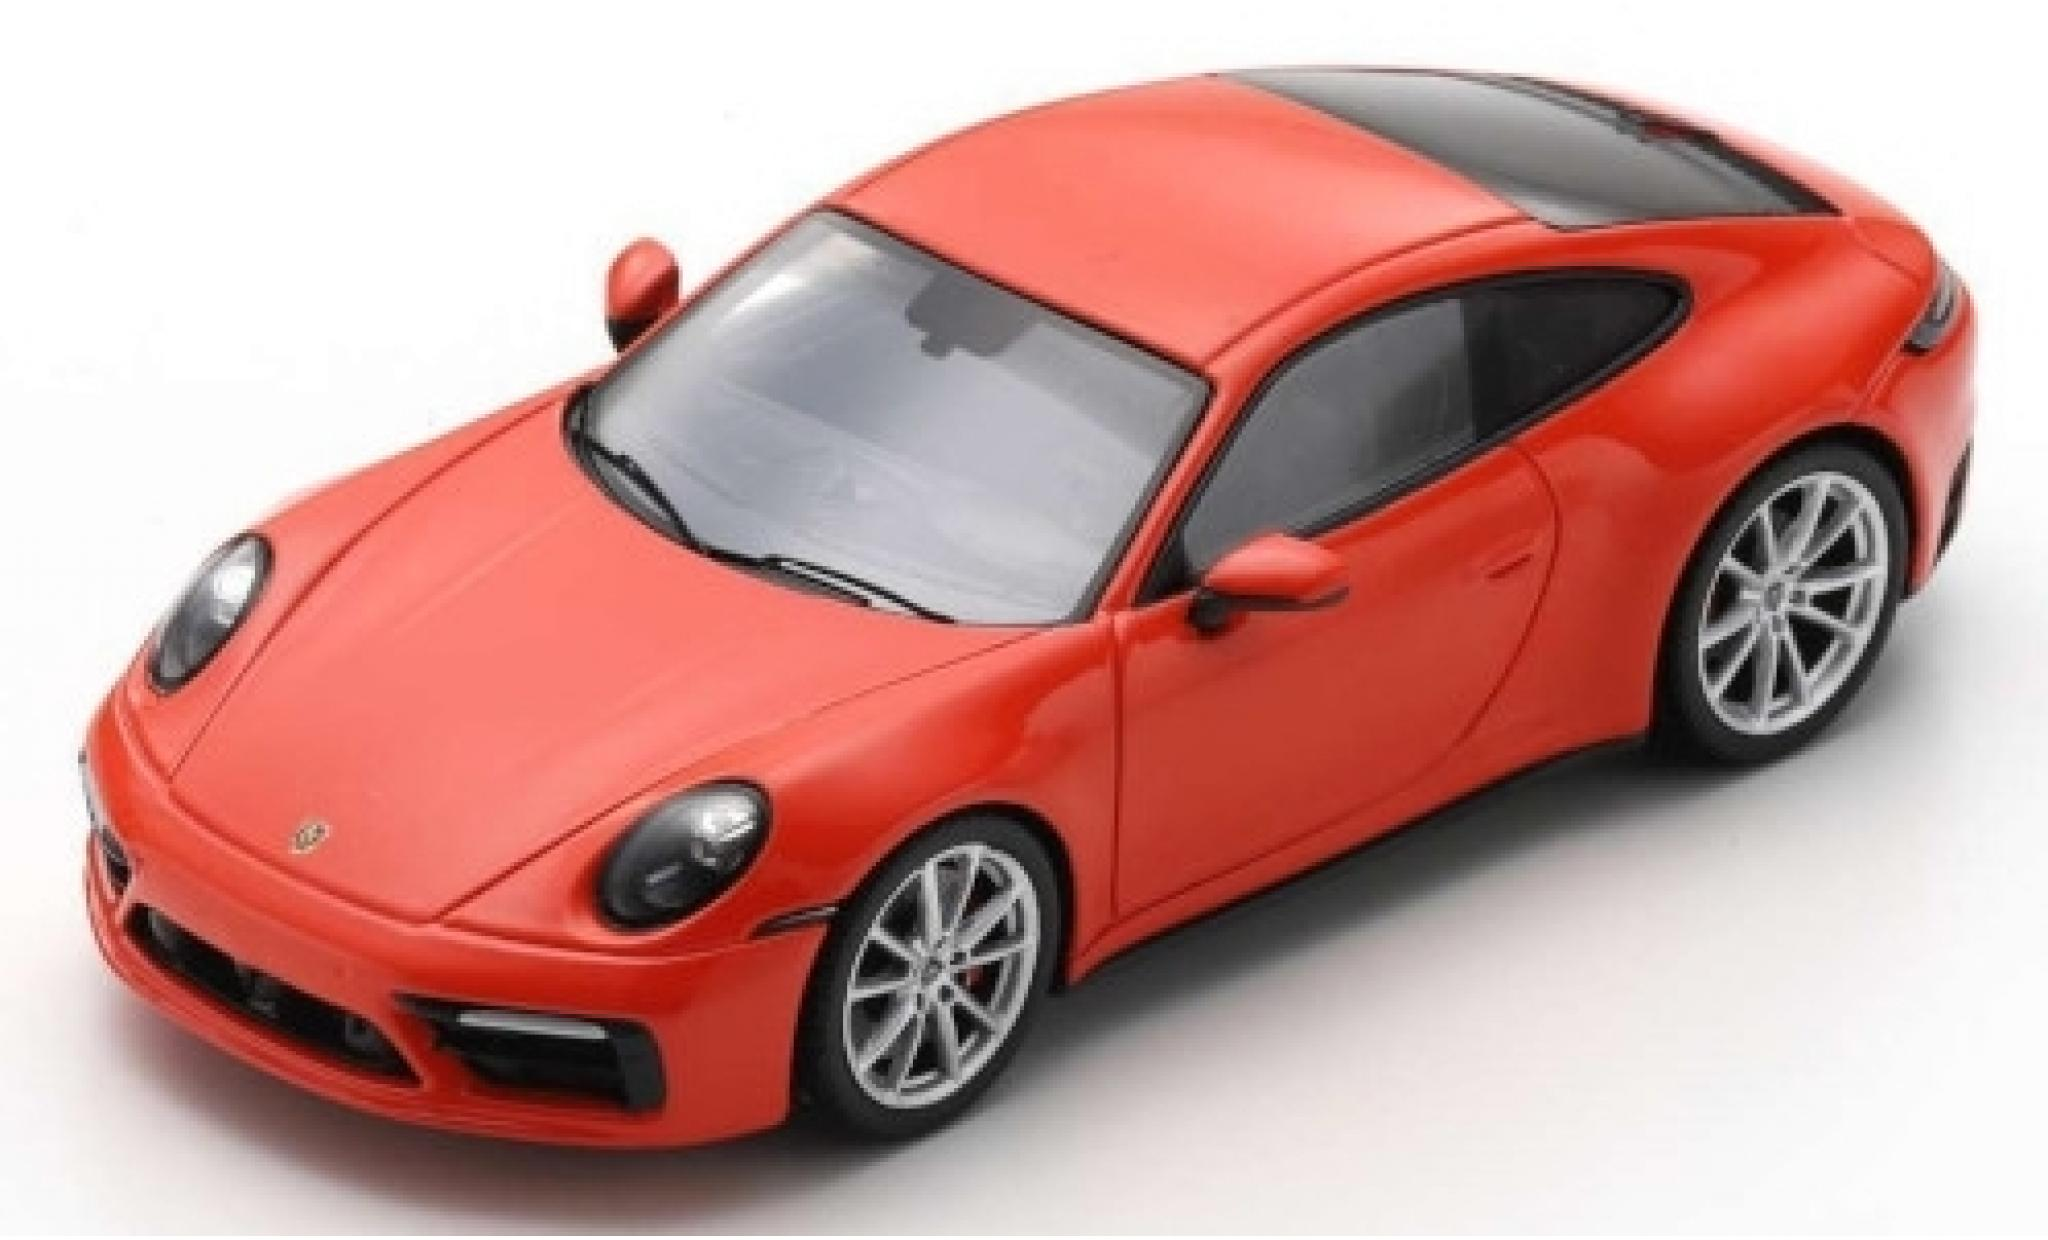 Porsche 992 S 1/43 Spark 911 Carrera  rot 2019